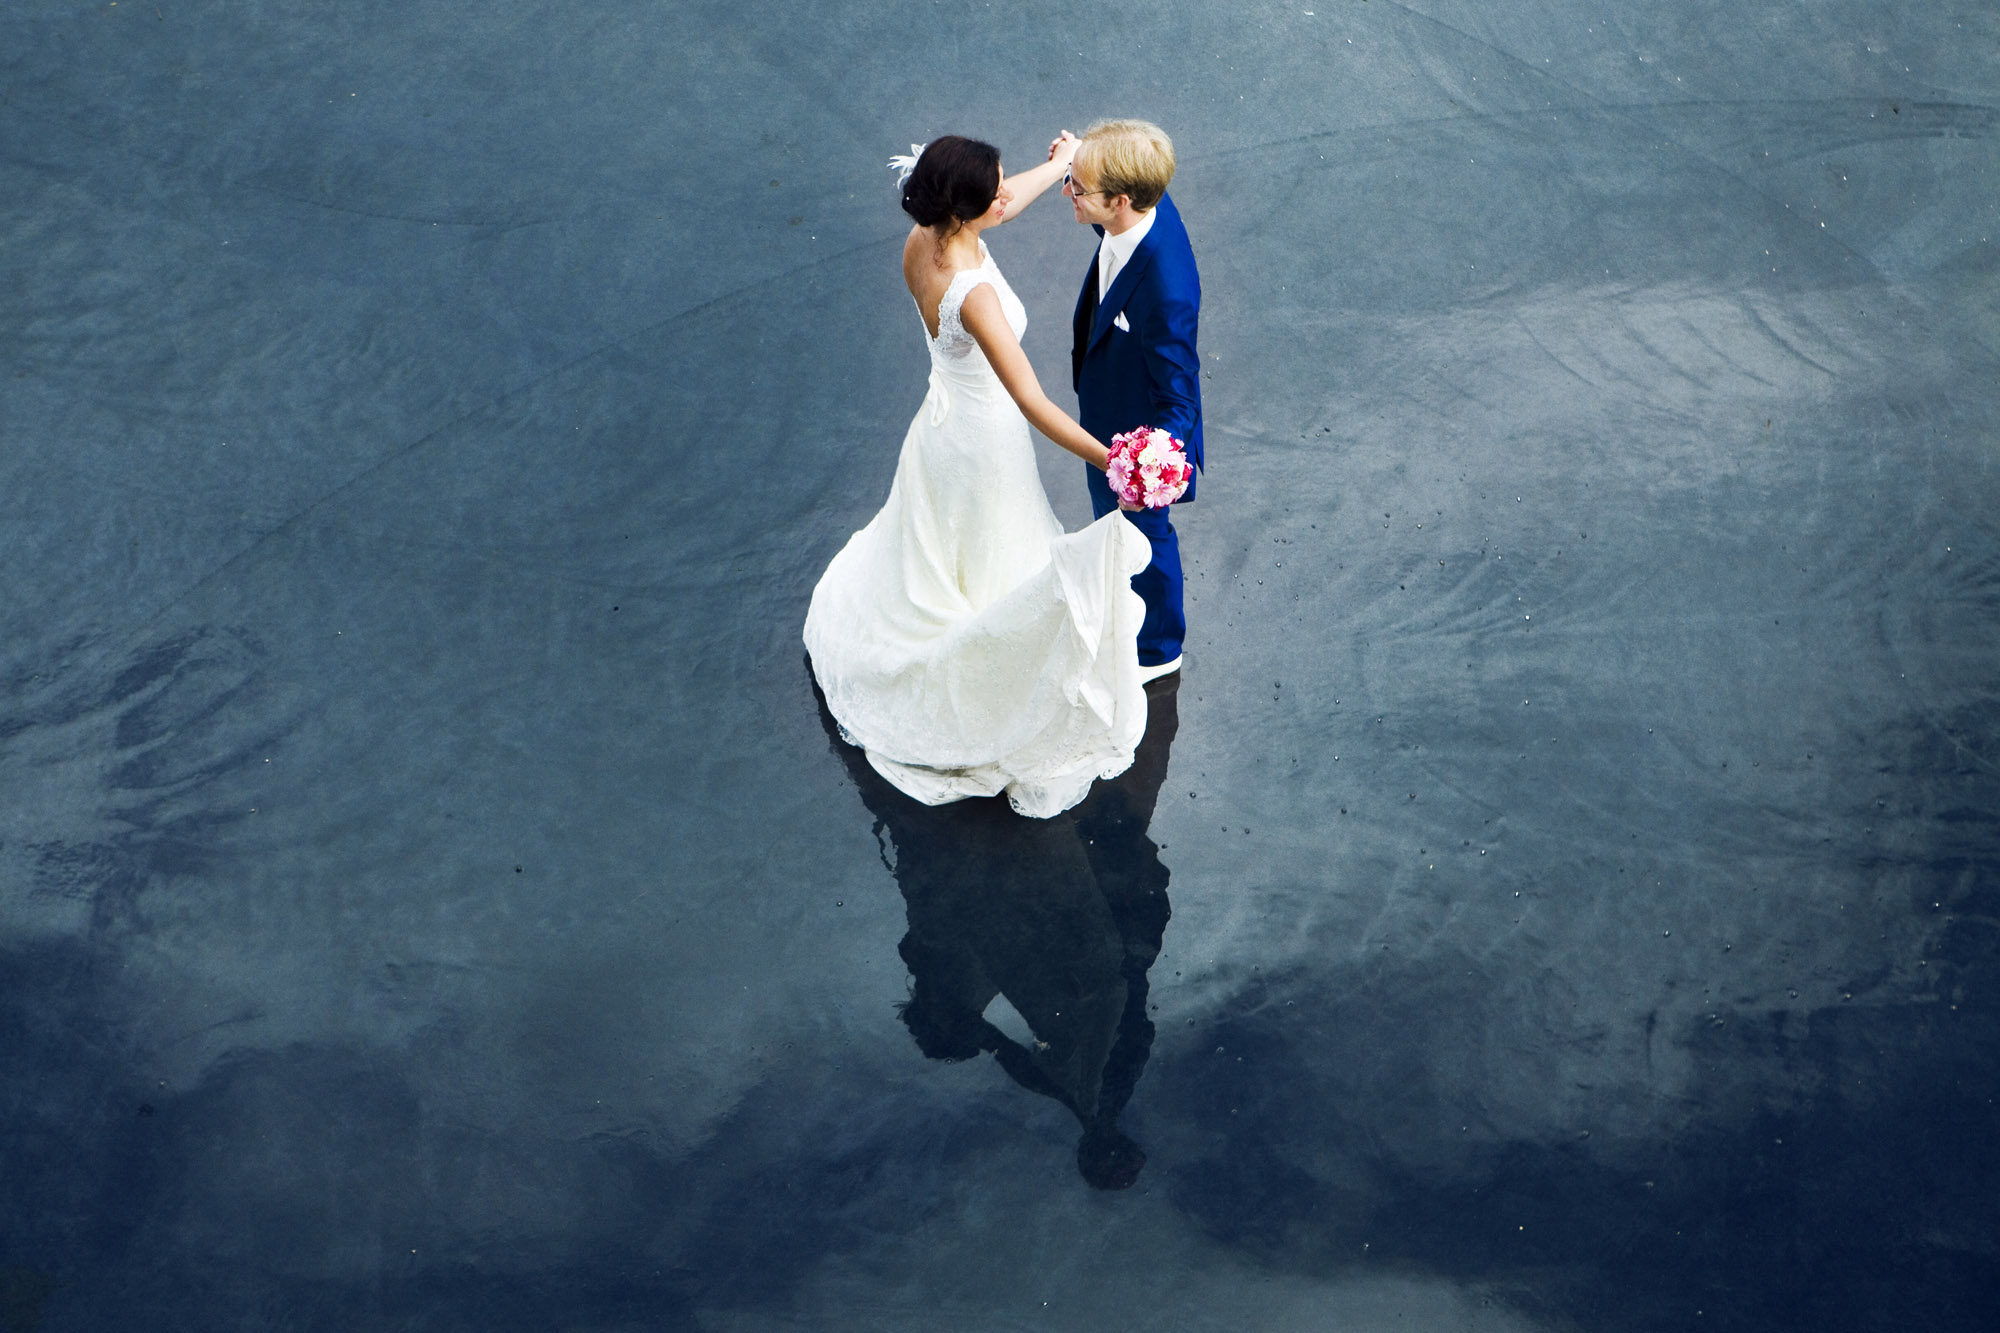 Bruidsfotografie bruiloft Kuyl's Fundatie Rotterdam bruidspaar dans op water